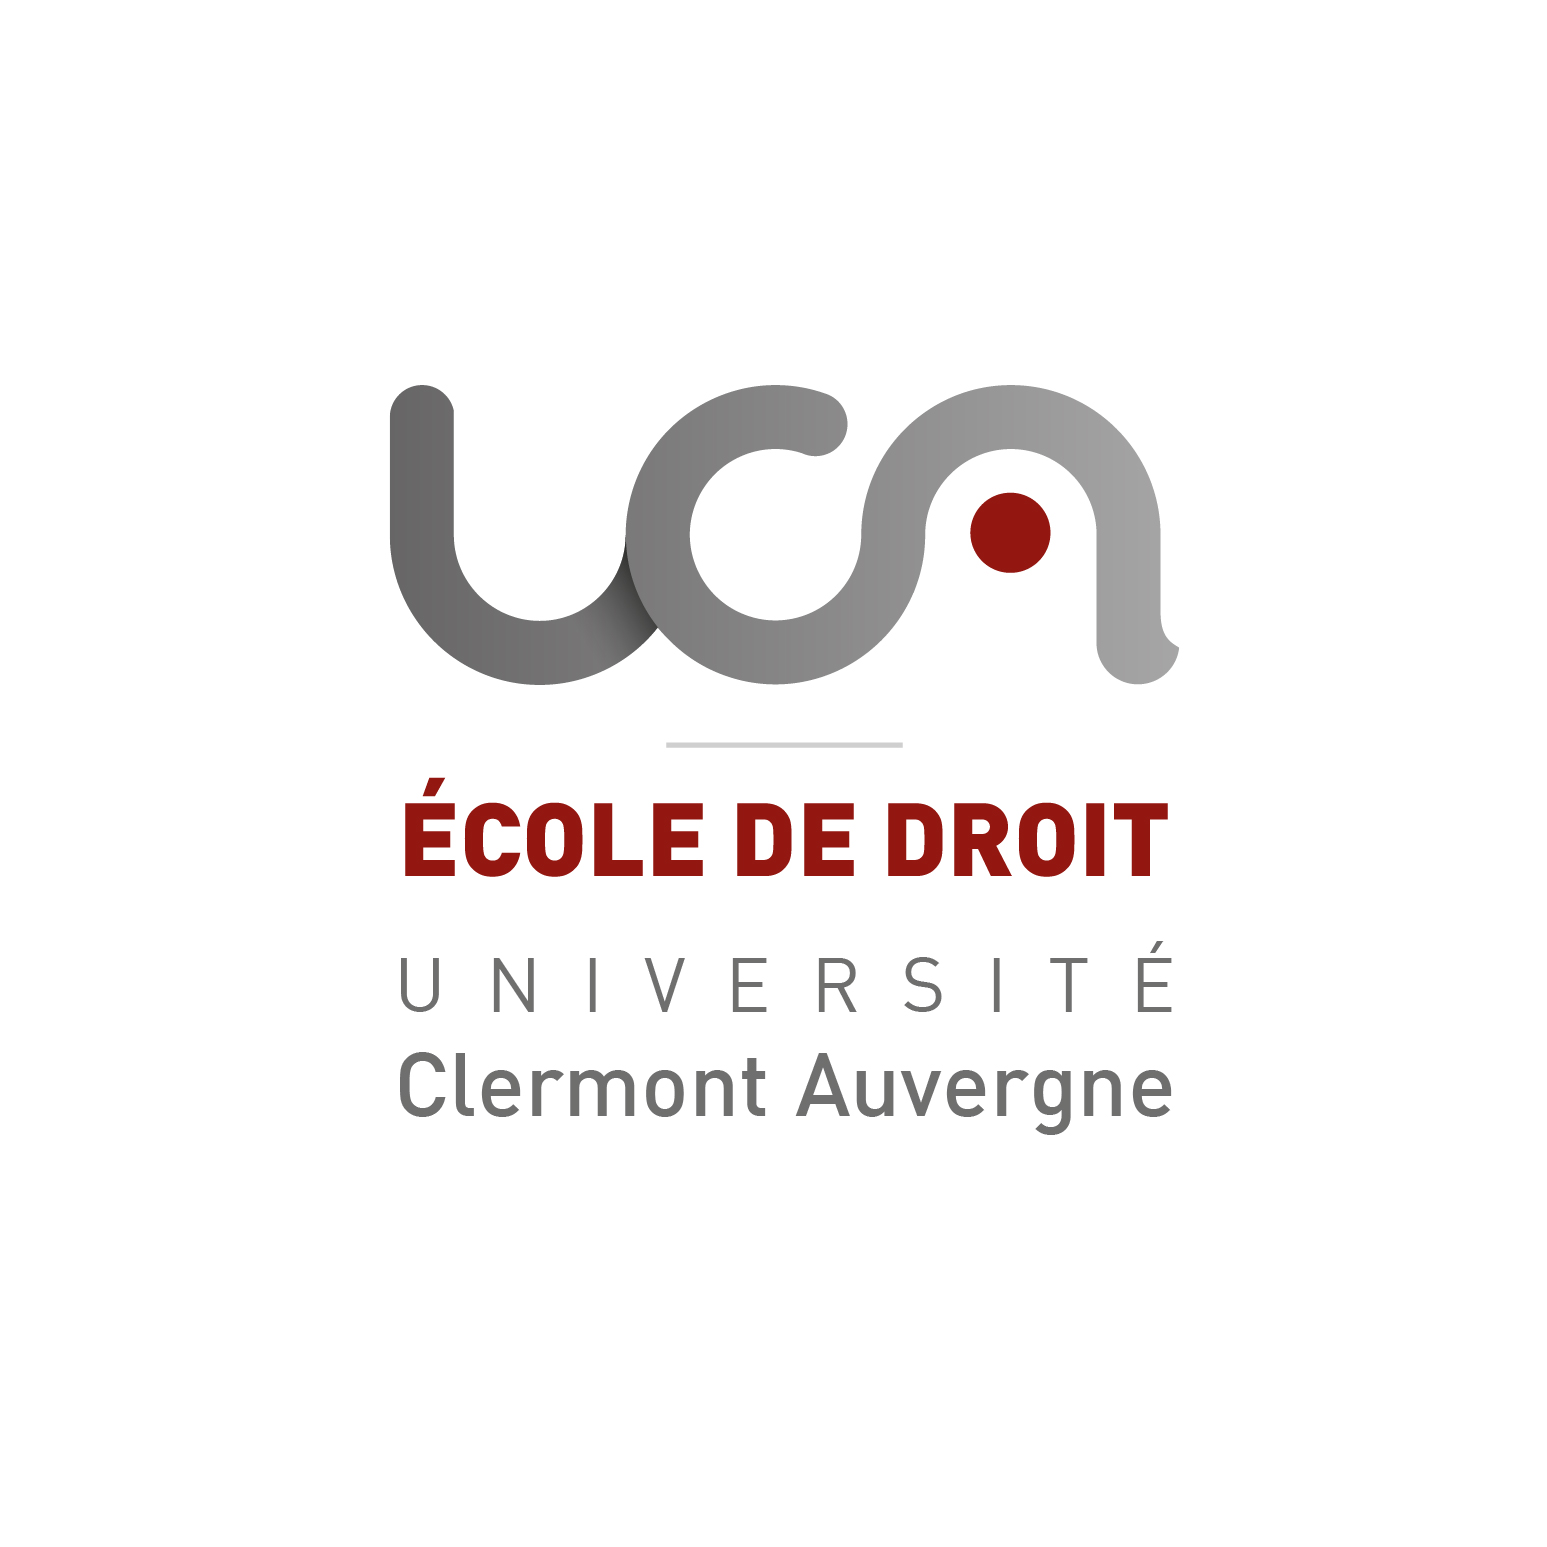 ecole_droit_logo_carre.jpg